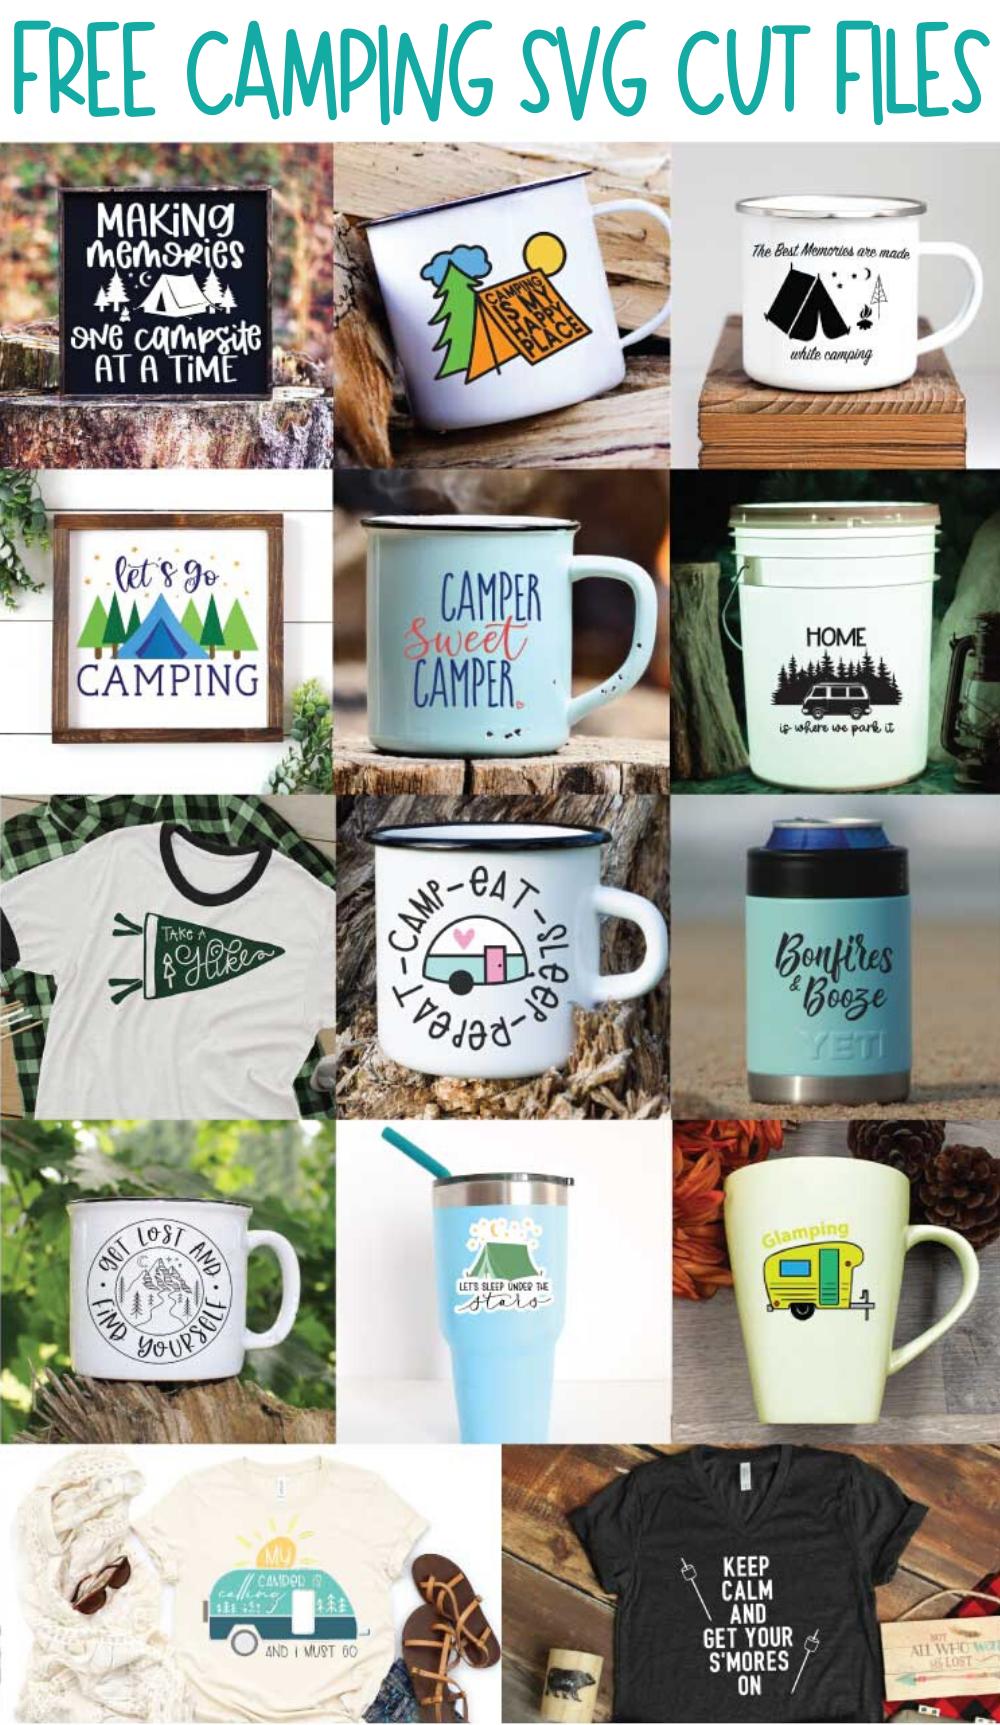 14 Free Camping Cut Files